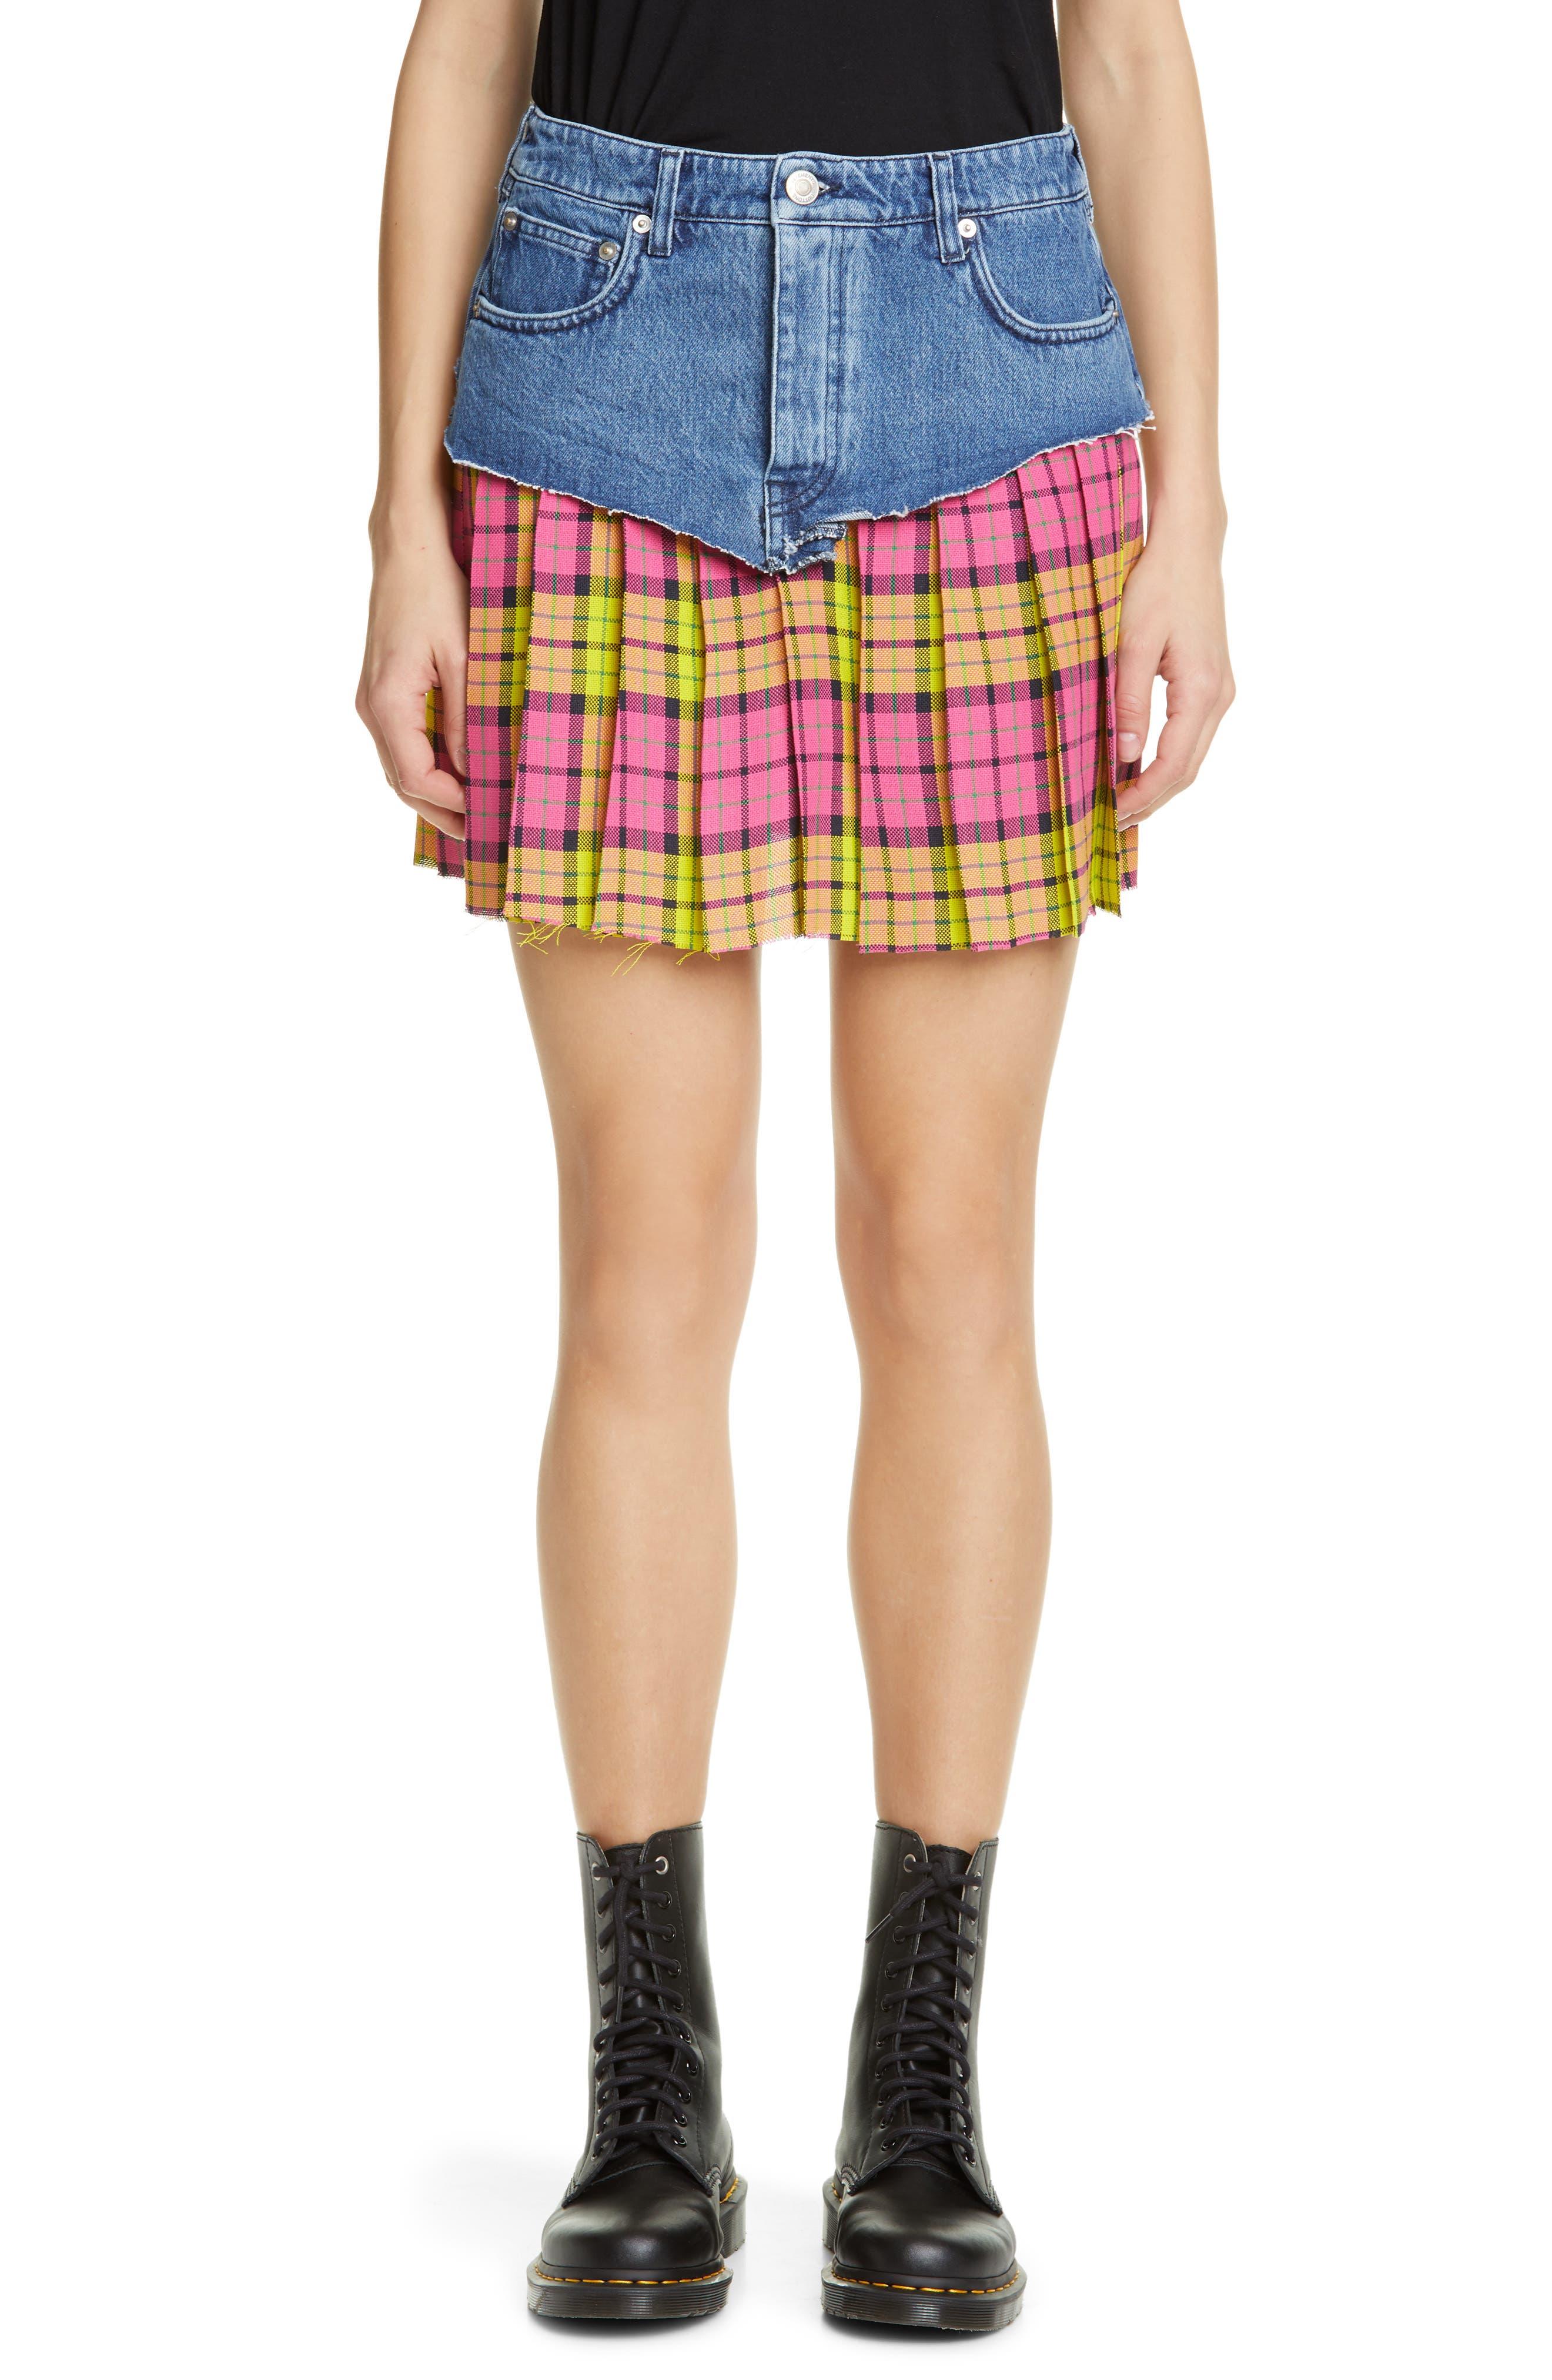 VETEMENTS, Schoolgirl Skirt, Main thumbnail 1, color, BLUE